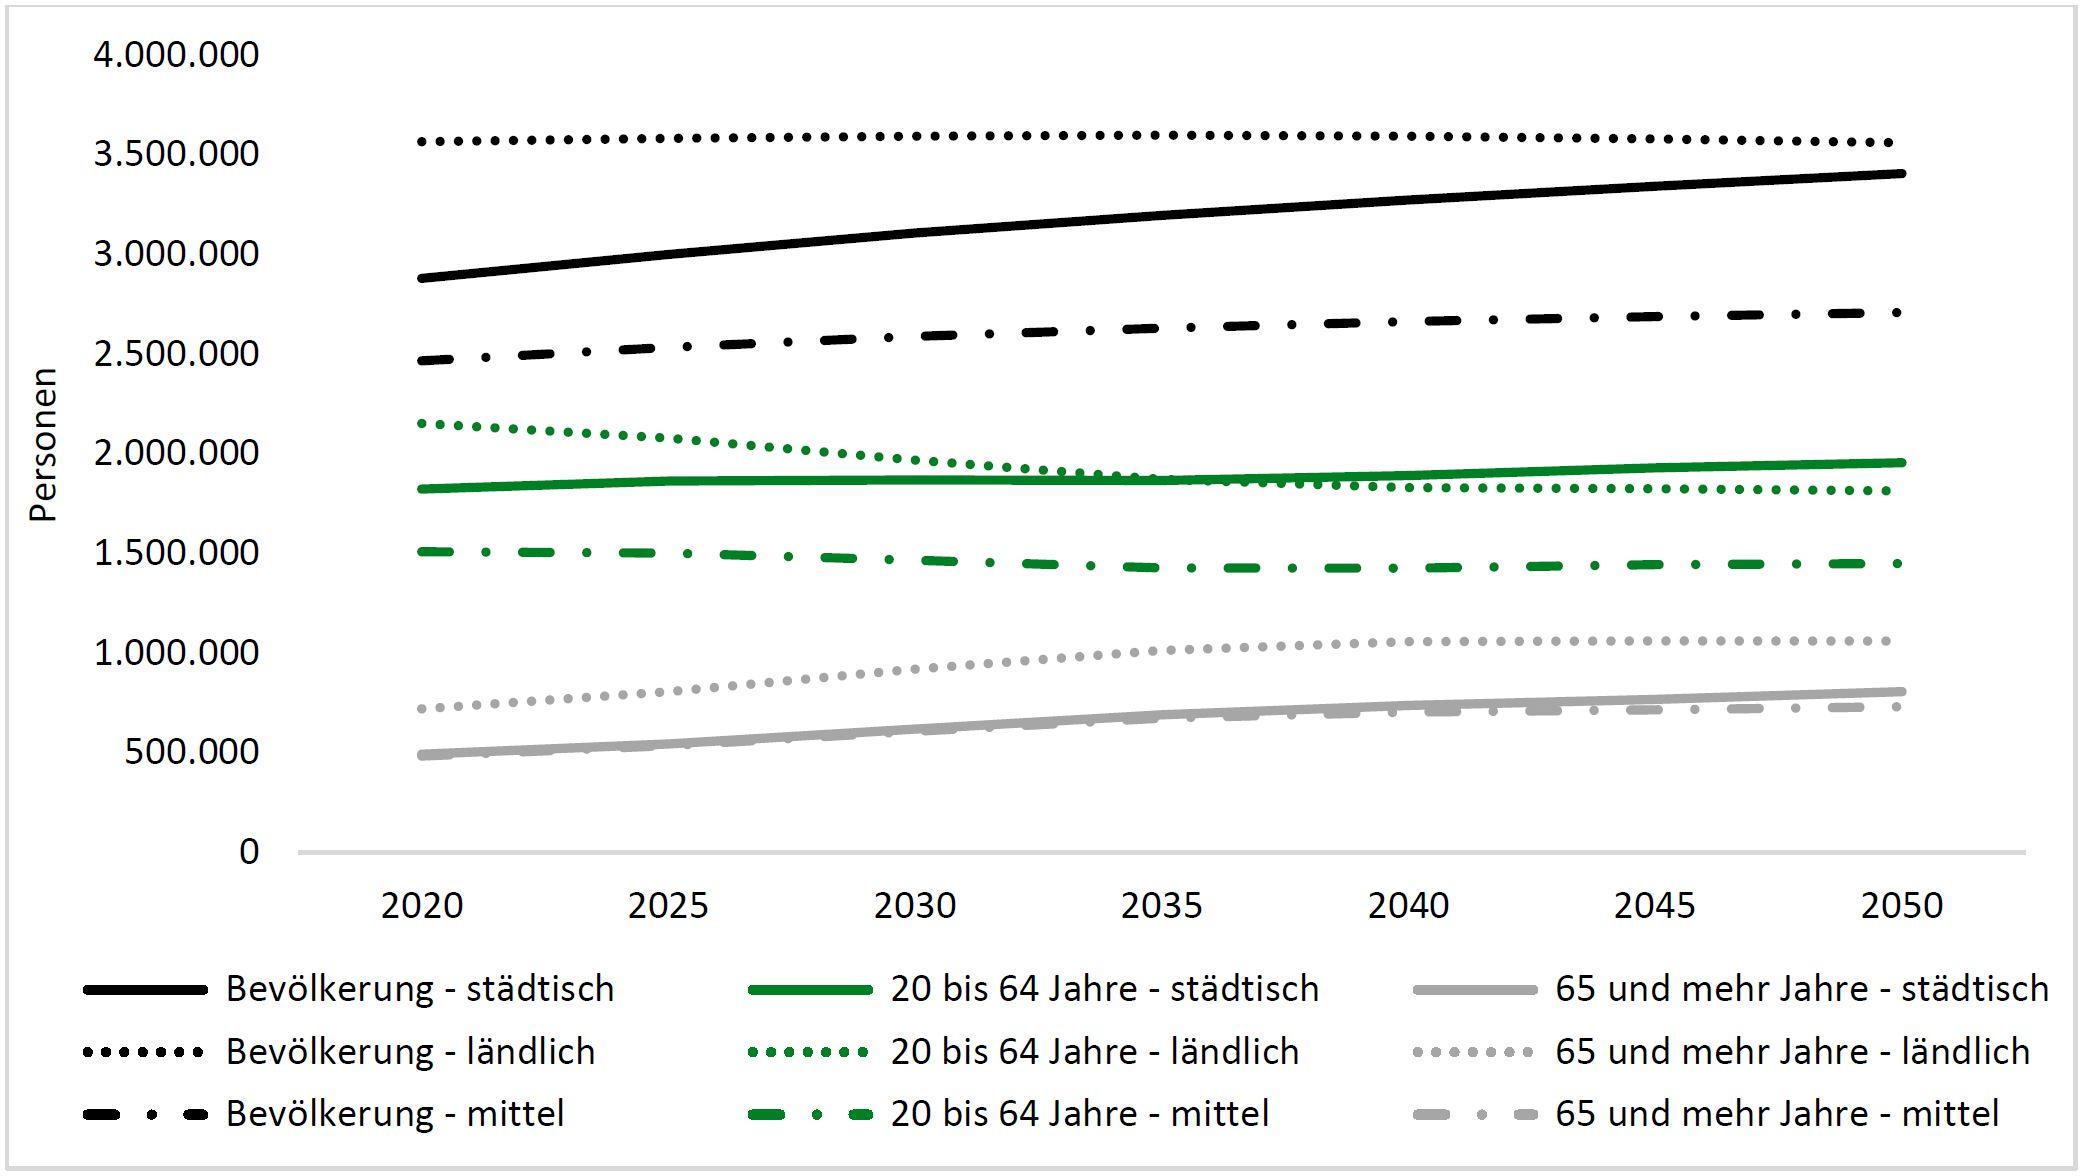 Bevölkerungsprognose bis 2050